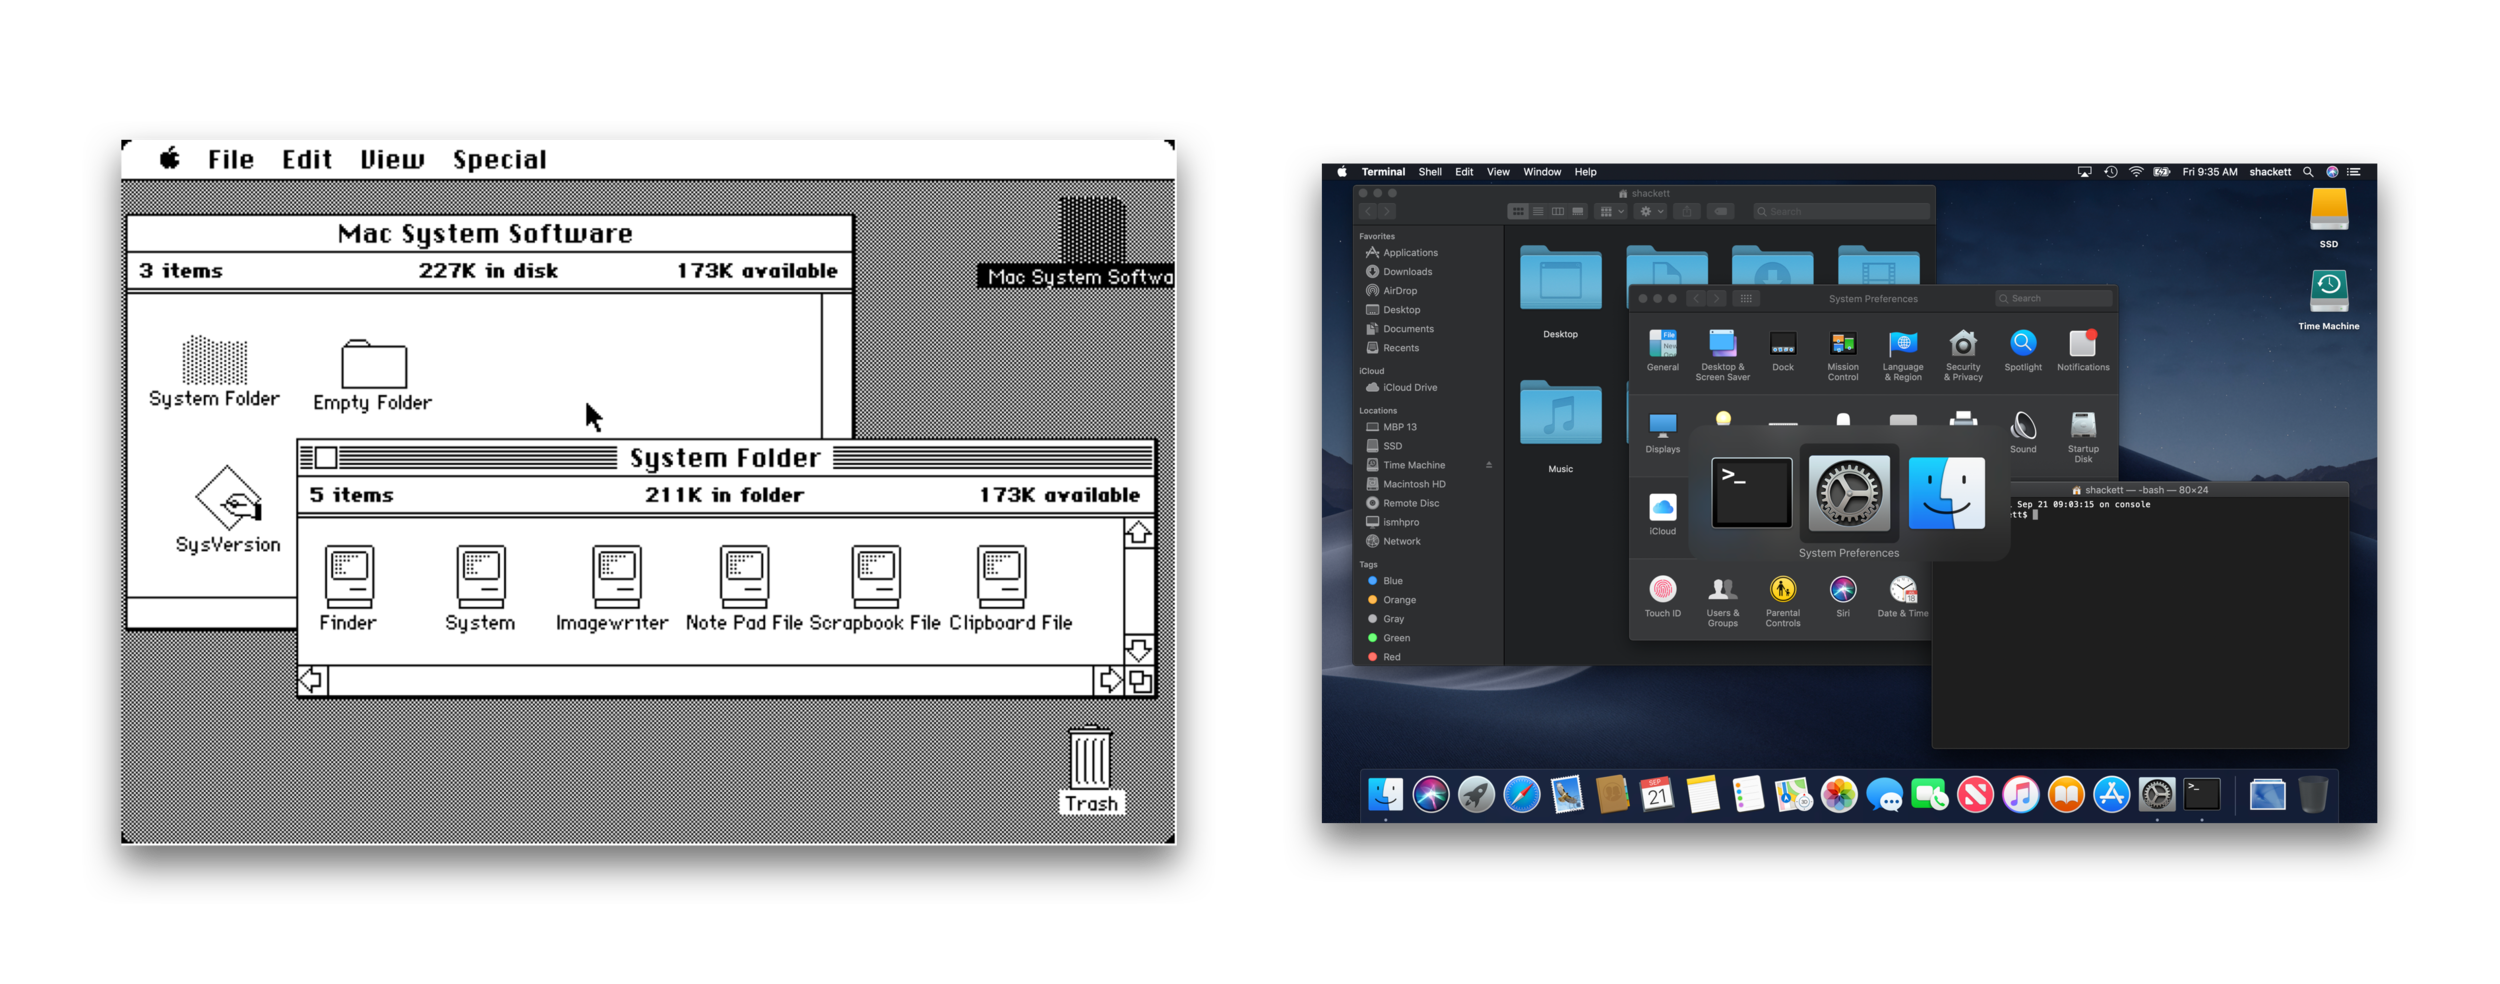 Mac OS 1984 and 2018 (34 years). Grid of icons, layered windows, cursor, desktop metaphor, omnipresent menu bar.